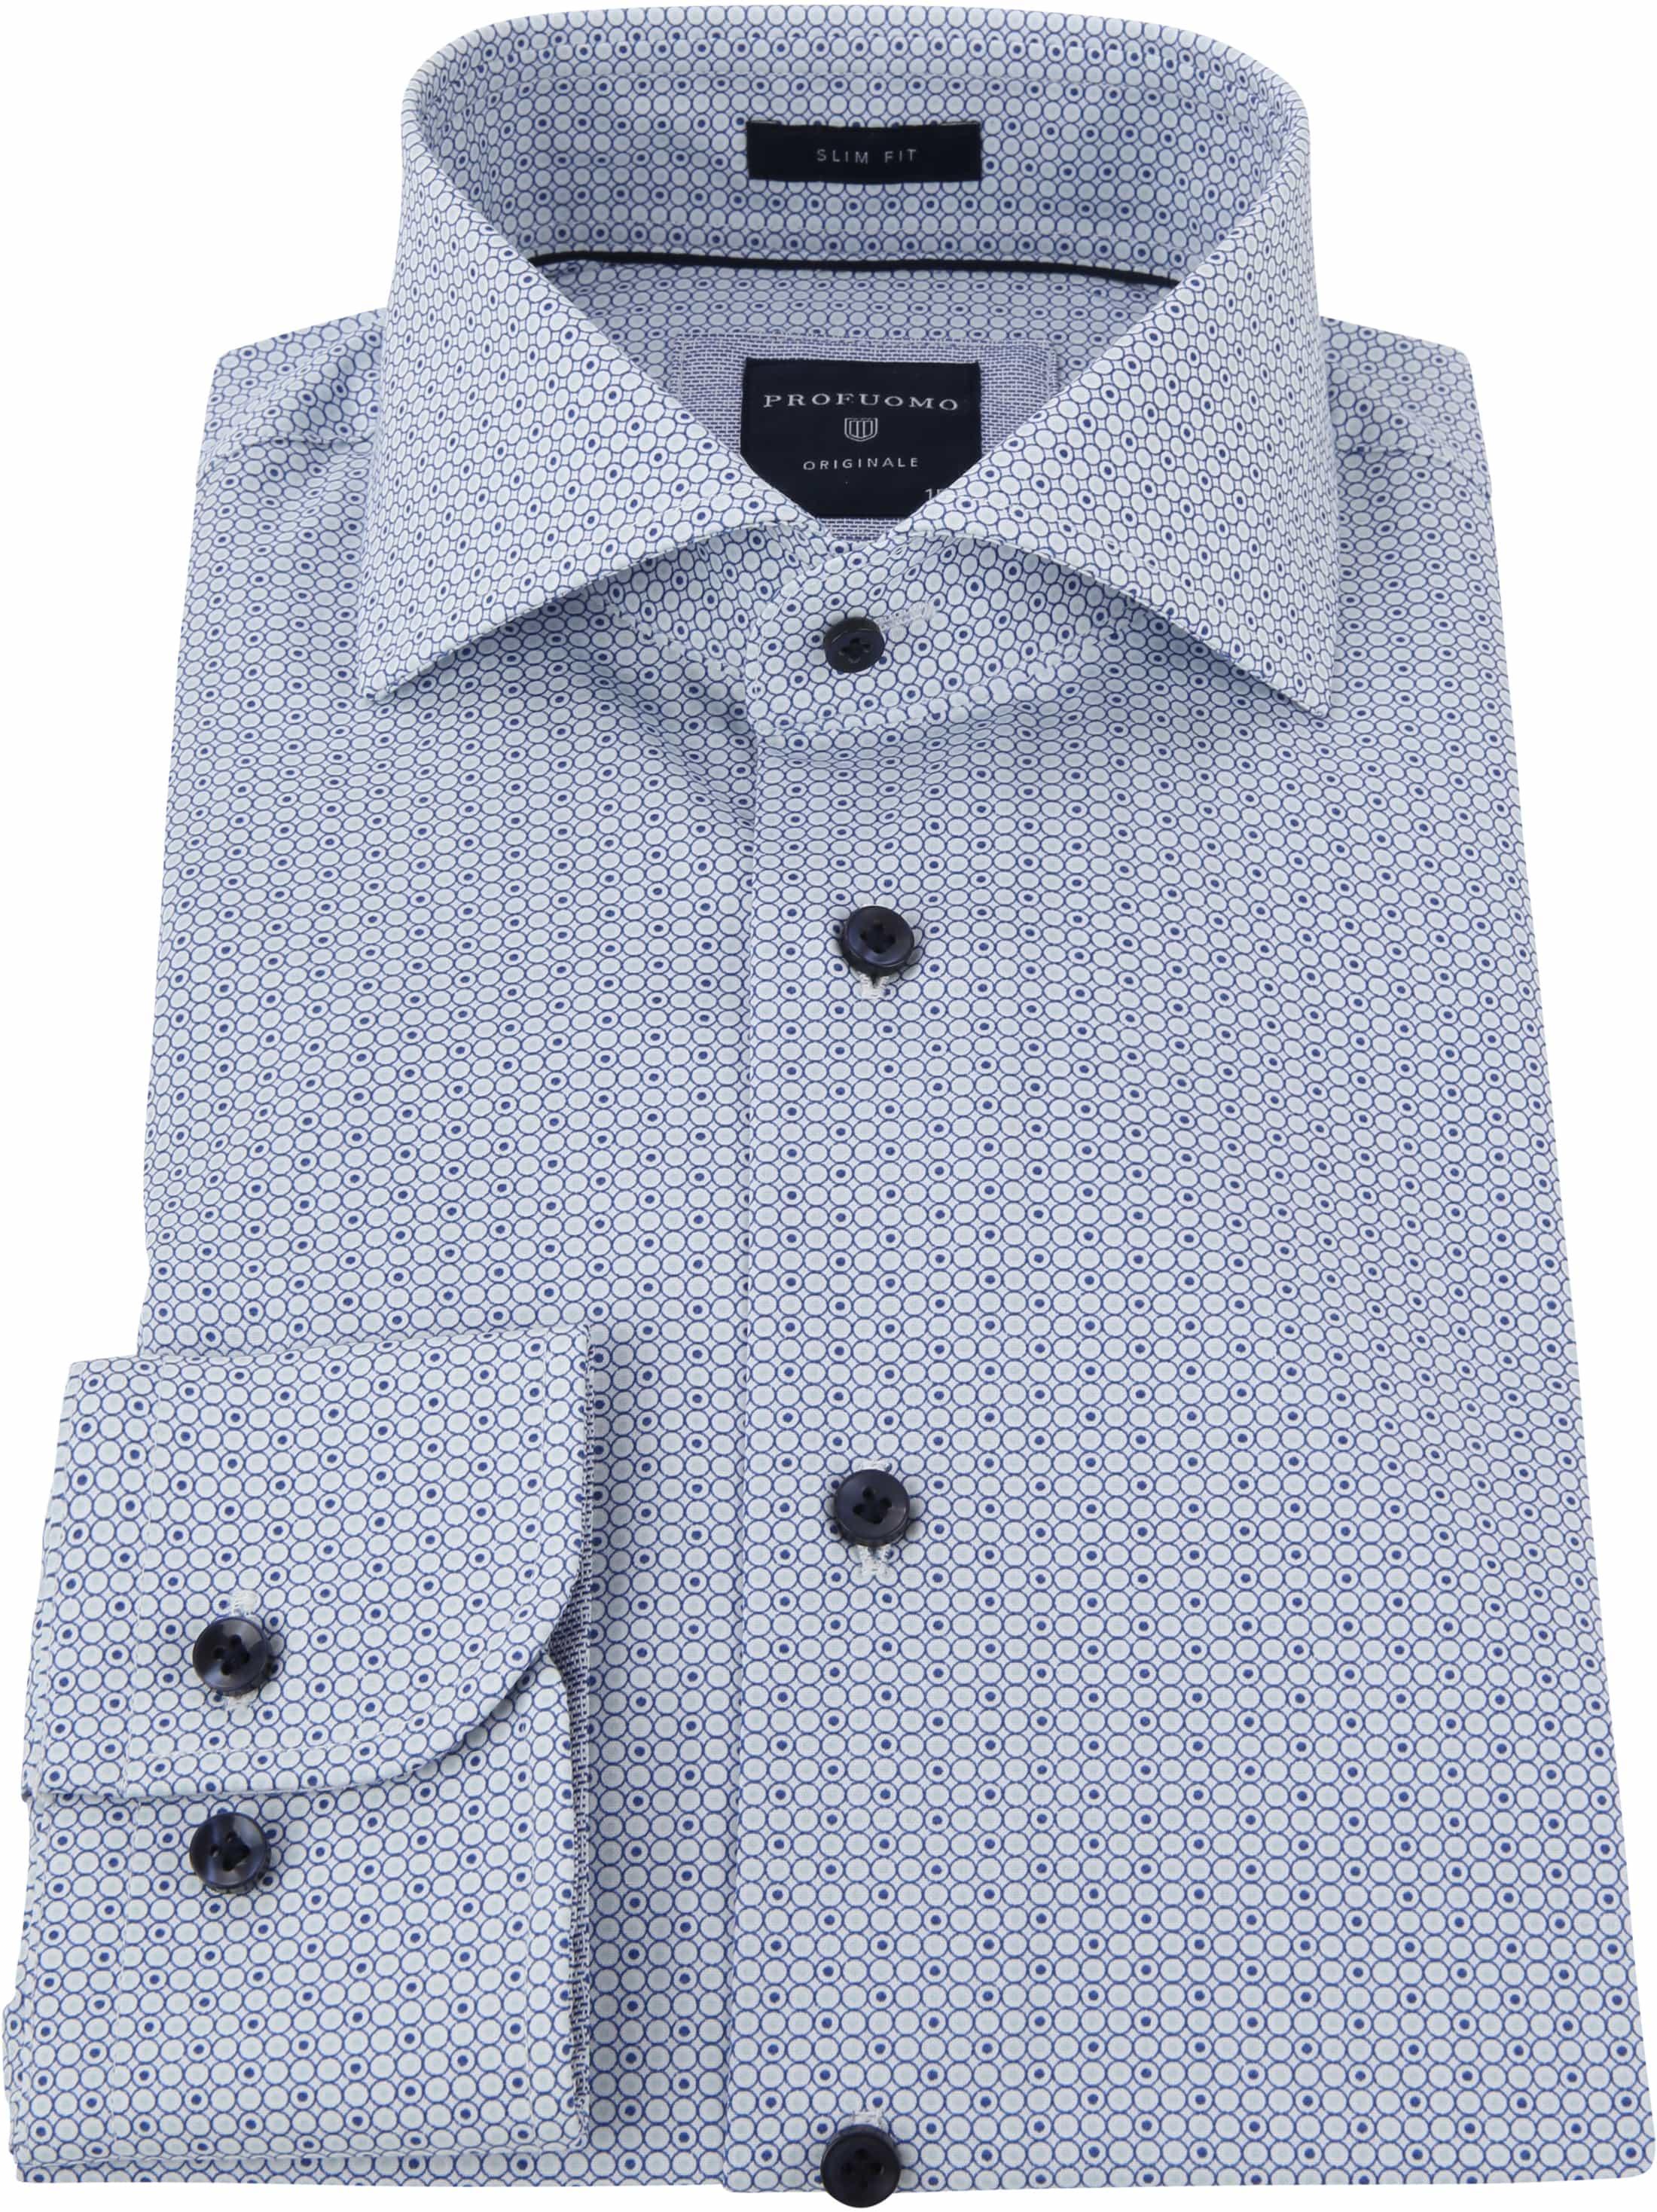 Profuomo Overhemd Print Blauw foto 3